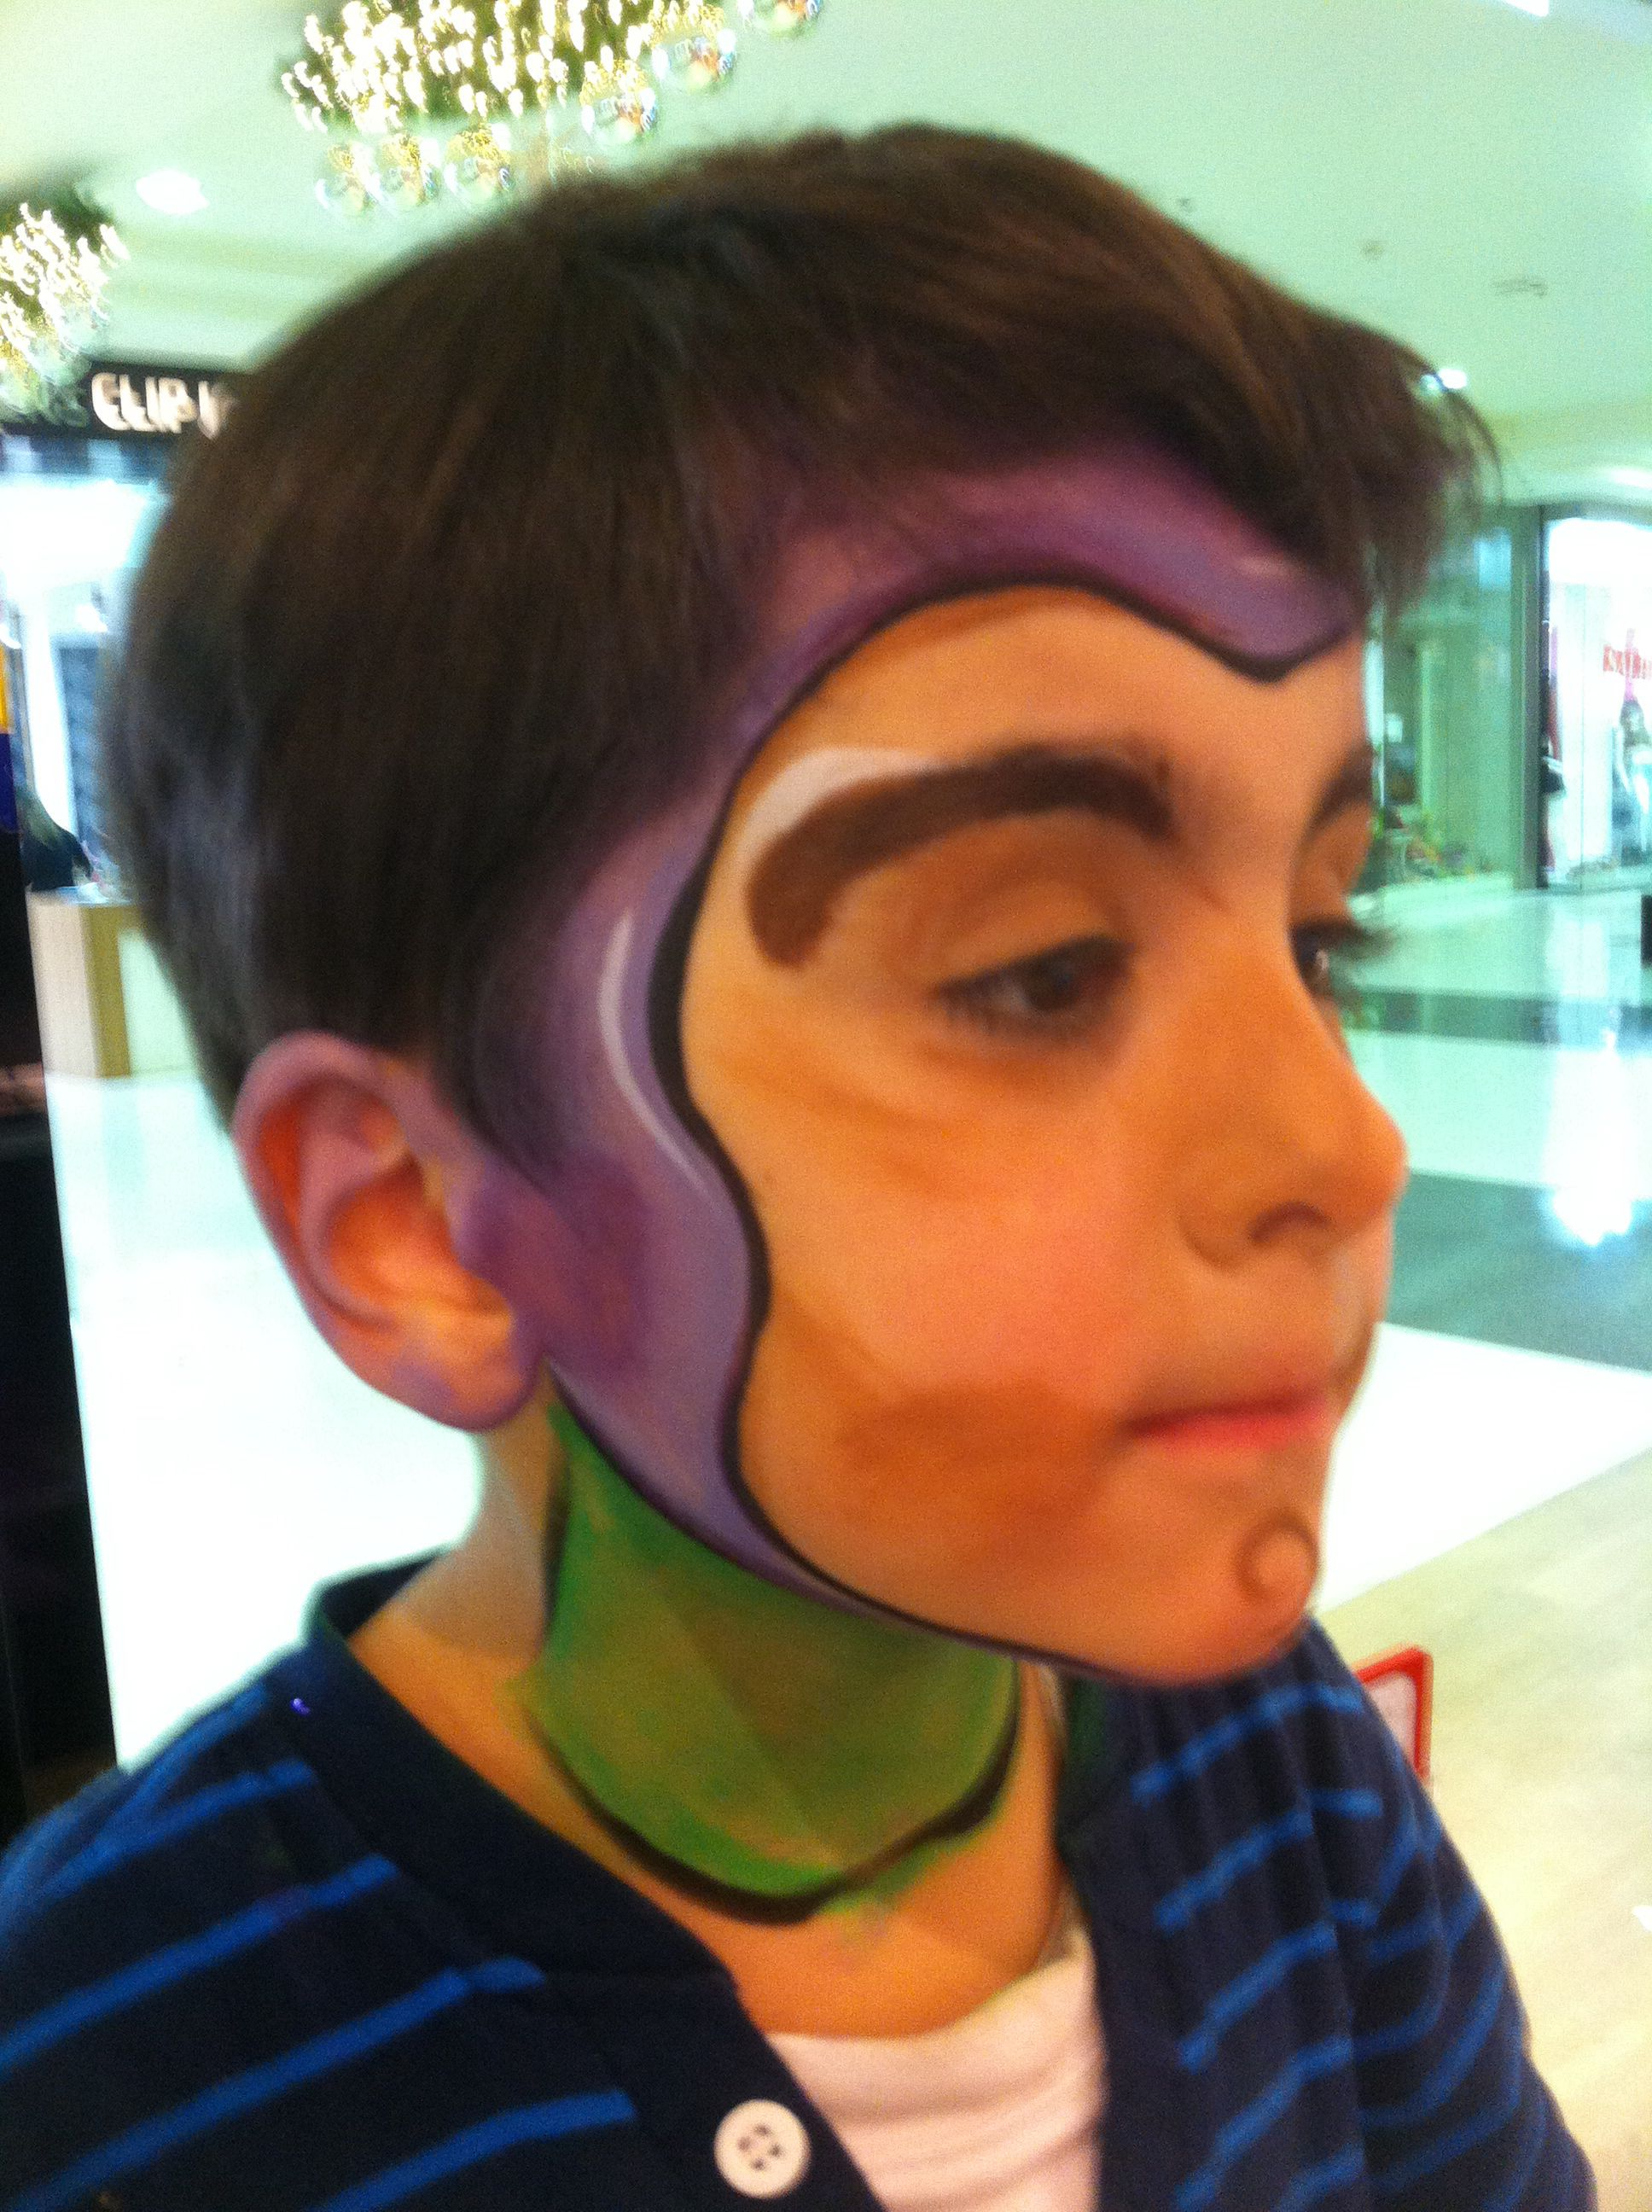 Buzz Lightyear by Cheekyface.co | toy story | Pinterest | Buzz lightyear